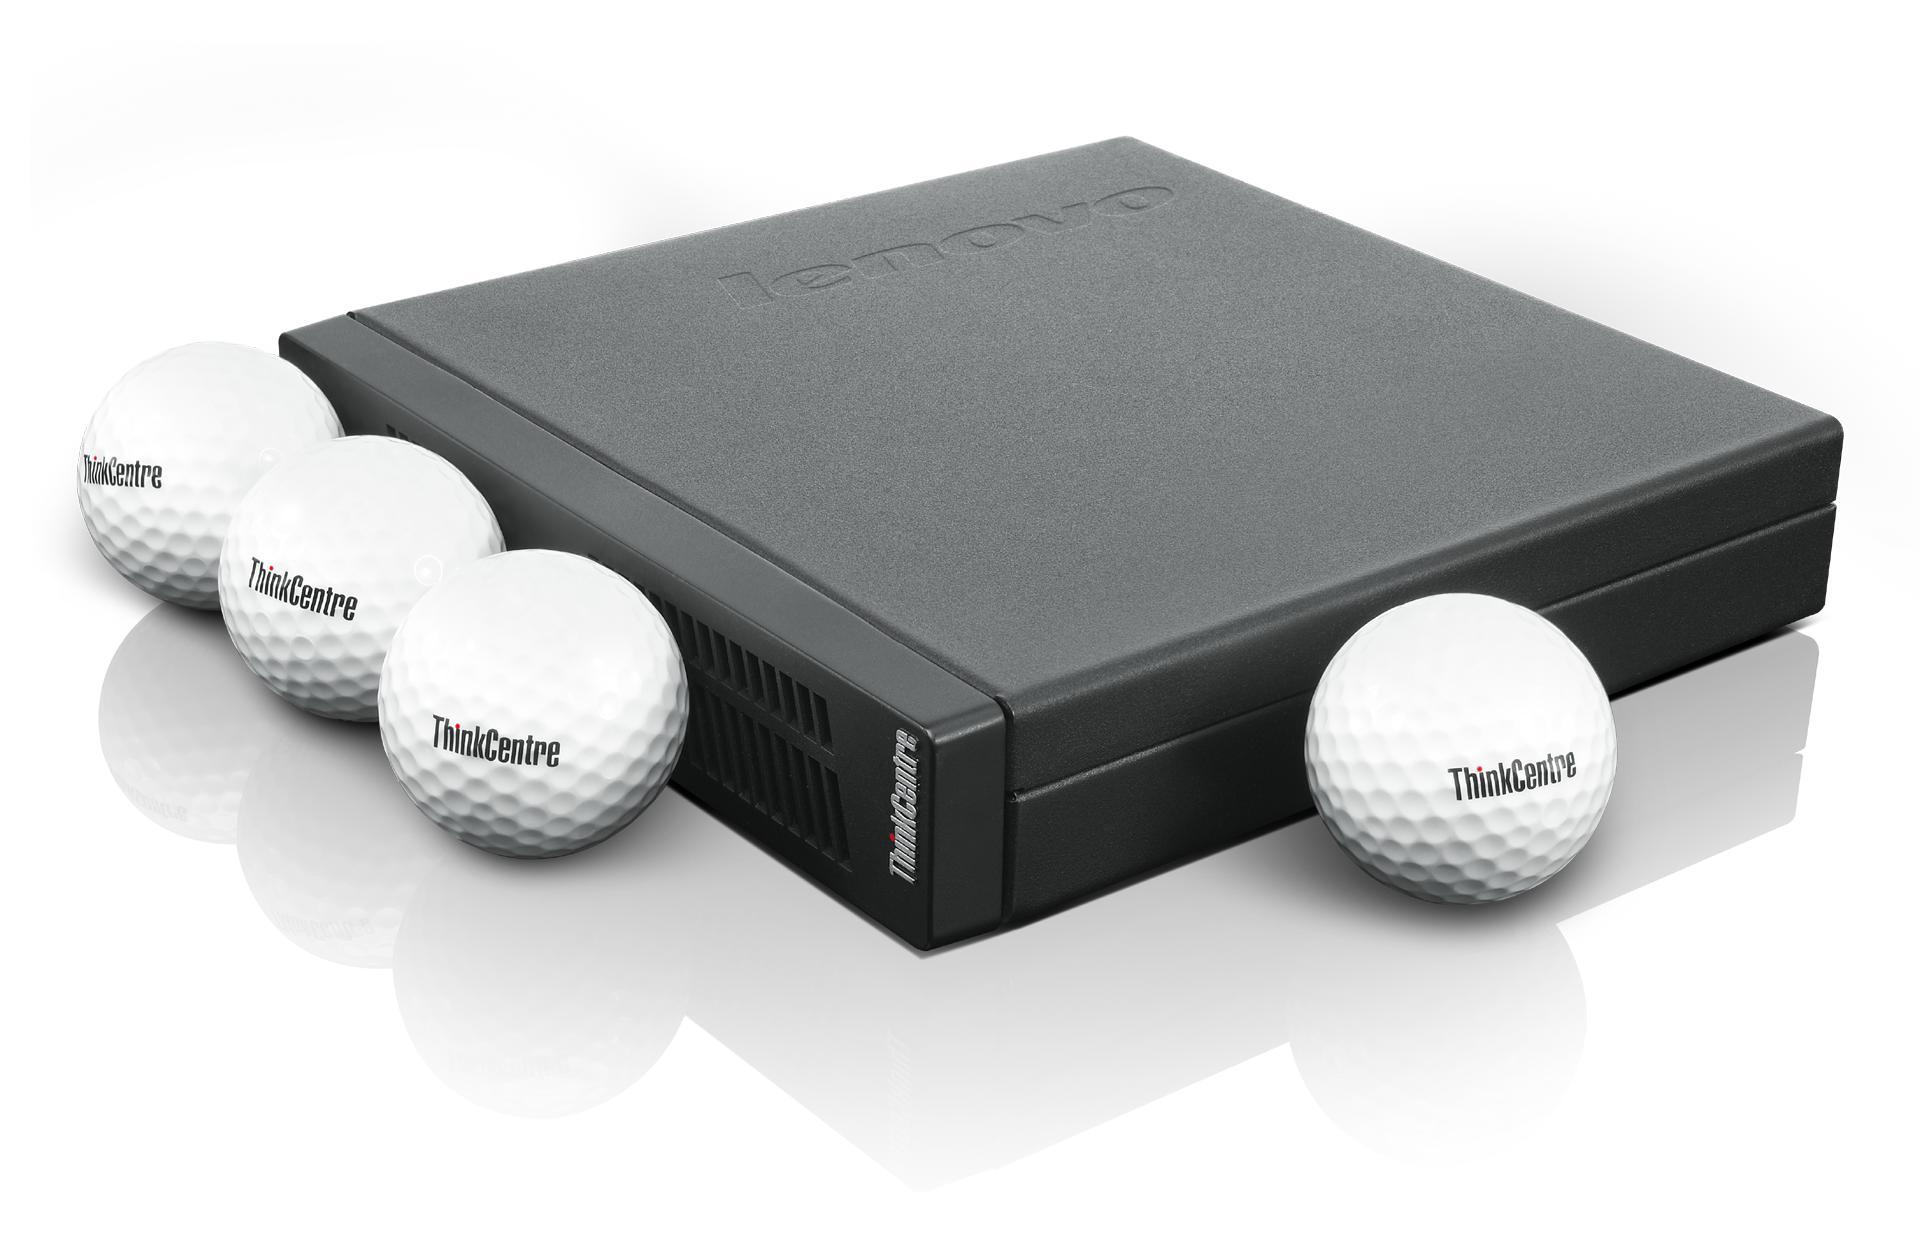 Lenovo ThinkCentre M92P Review